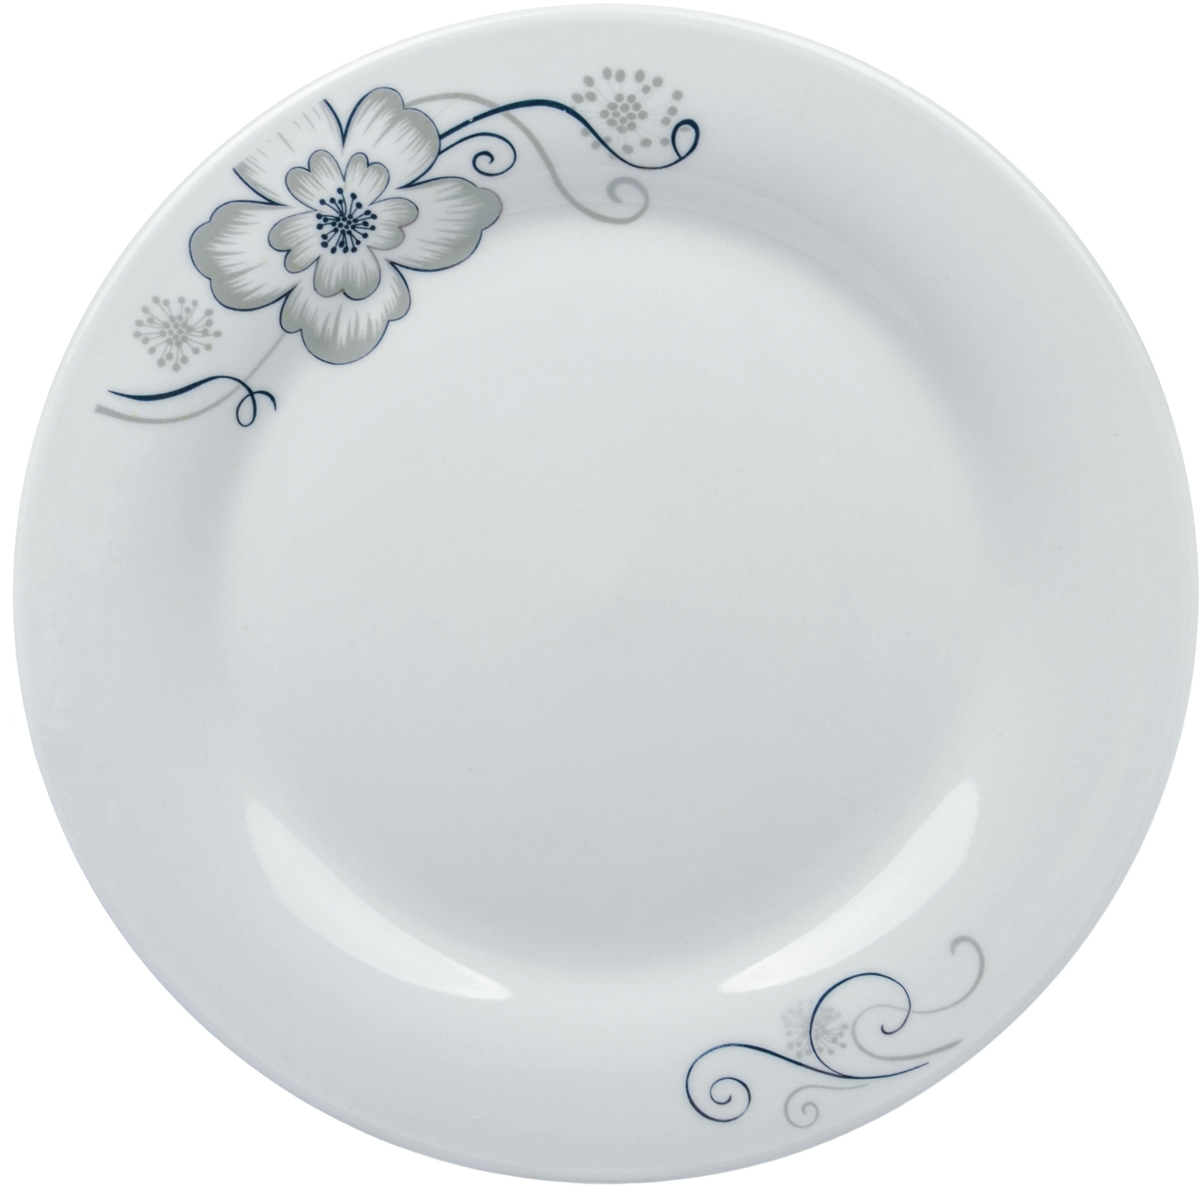 Тарелка Ningbo Royal Серый цветок, диаметр 23 см фарфоровая посуда дулево на авито